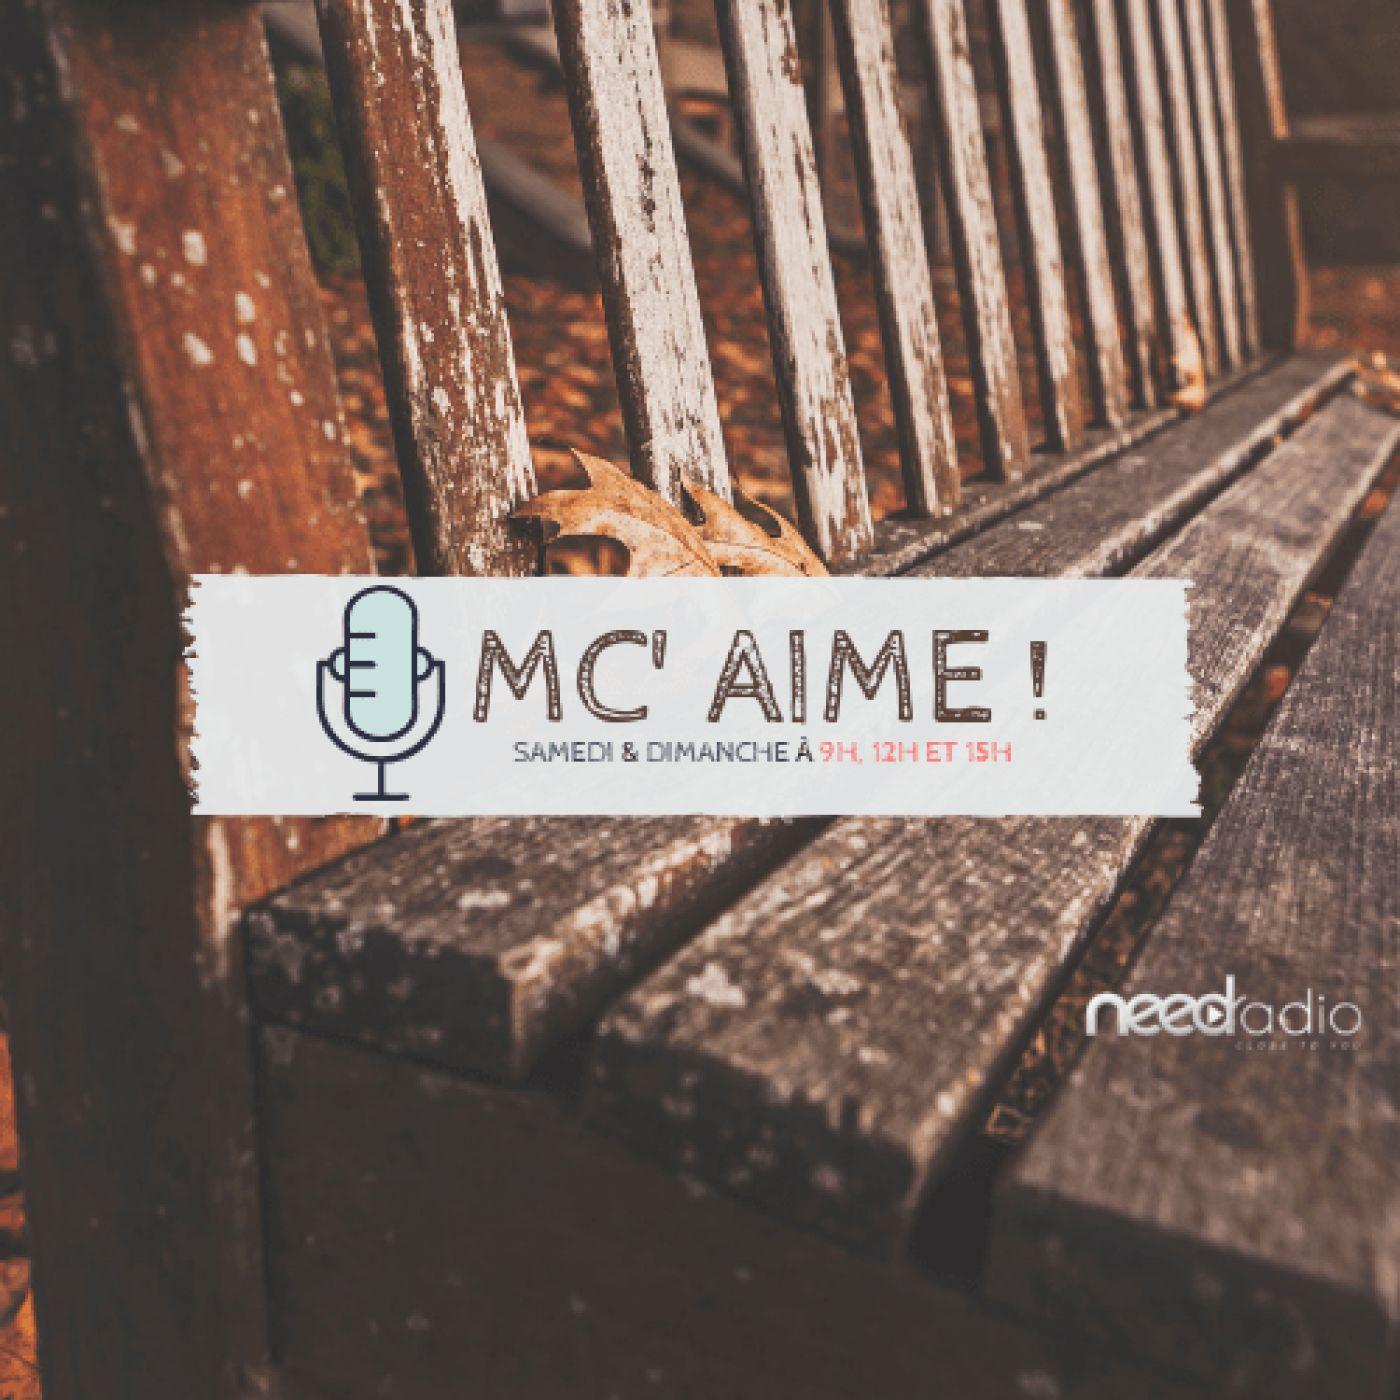 MC' Aime - Ma radio, histoire amoureuse au Lucernaire (31/03/19)